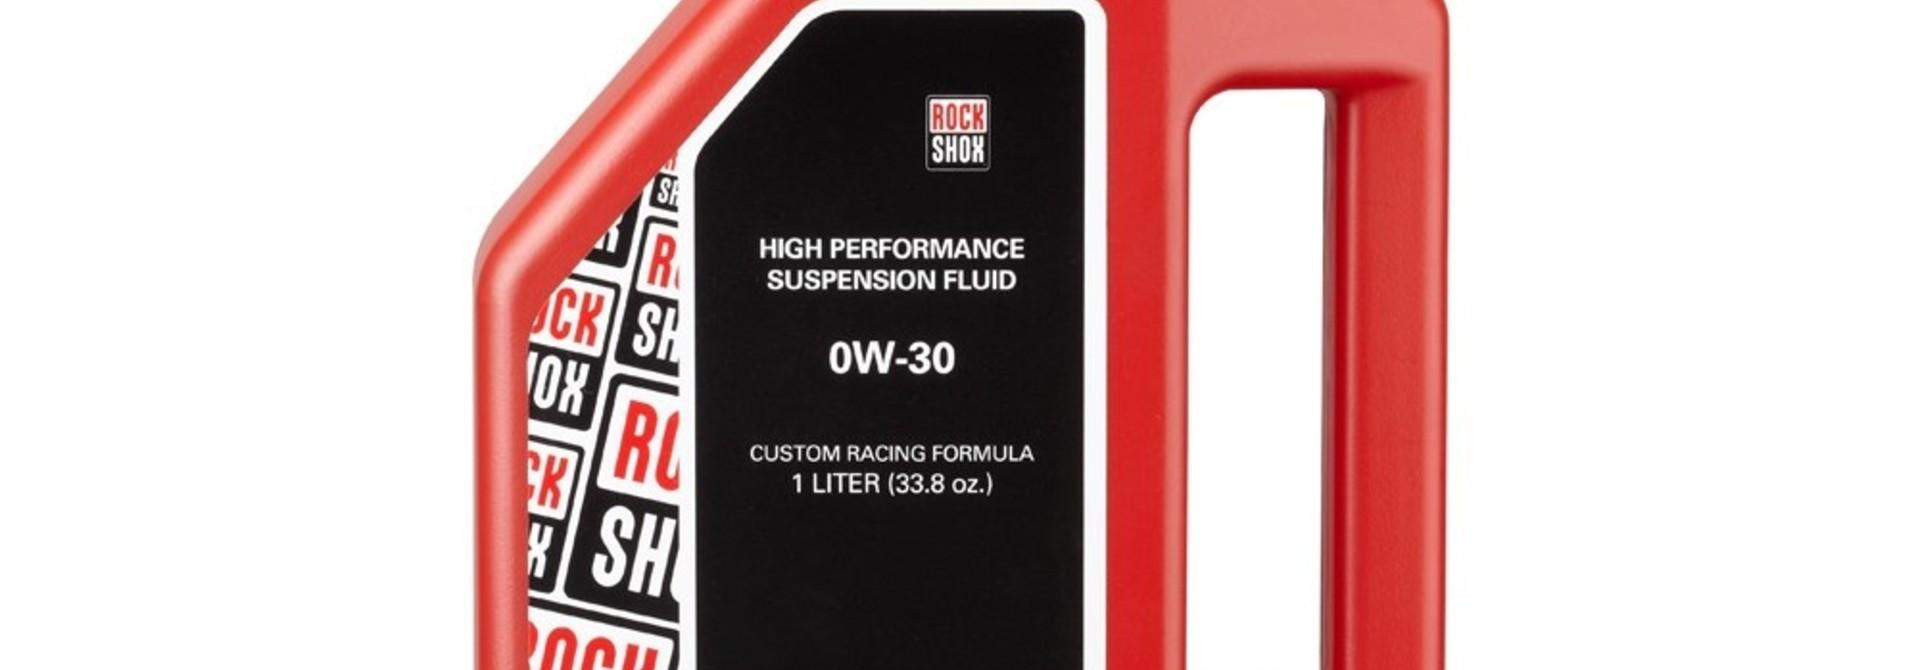 RockShox High Performance Suspension Fluid 0W-30 (1L)